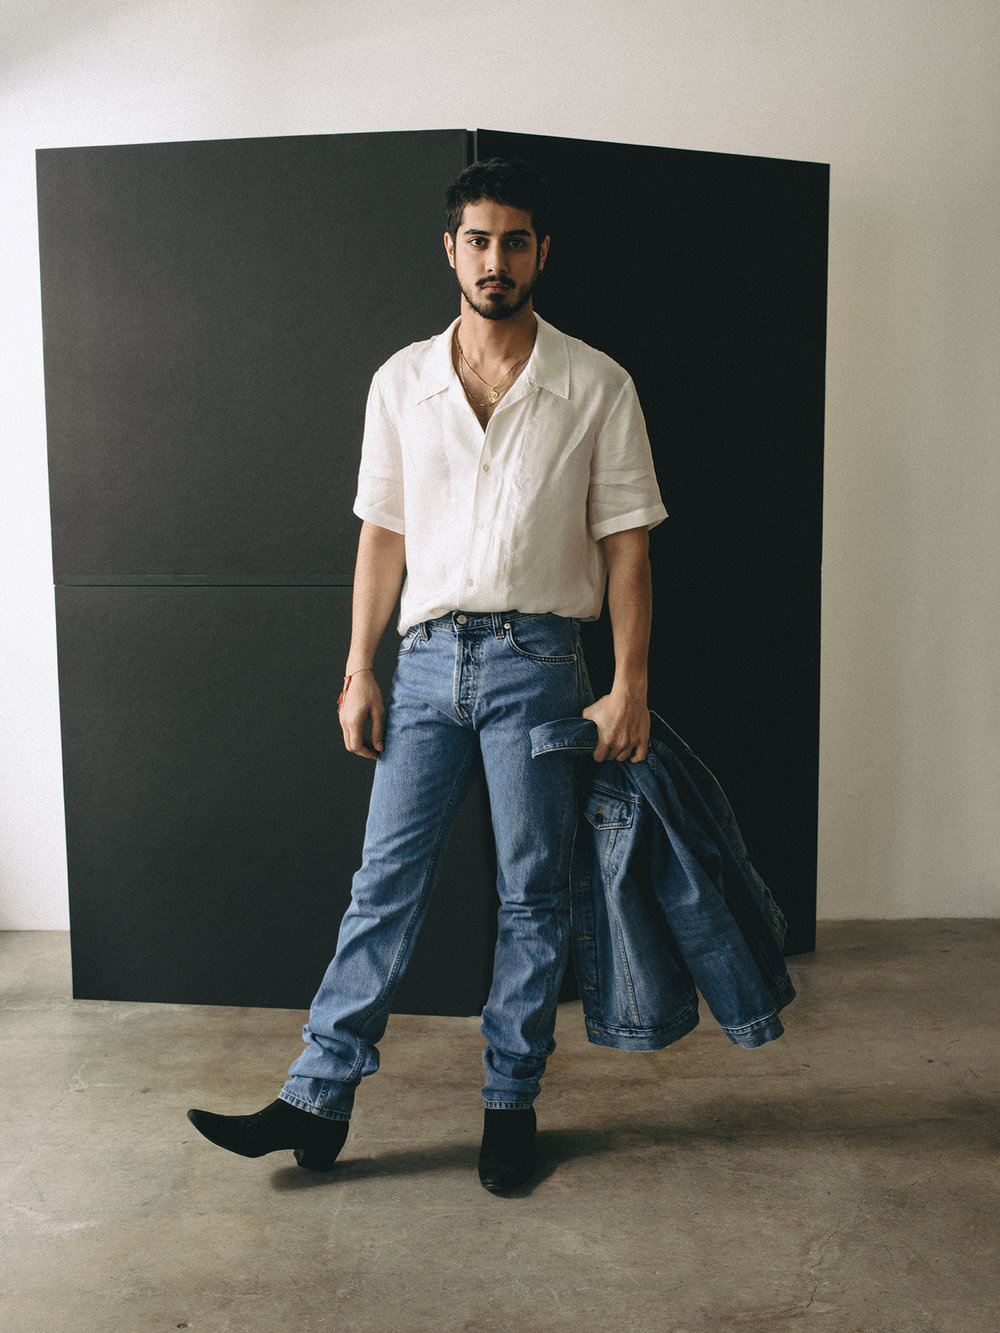 Shirt and denim by   HELMUT LANG    /    Bloomingdales Beverly Center  ; Denim Jacket by   ALEXANDER WANG    /    Bloomingdales Beverly Center